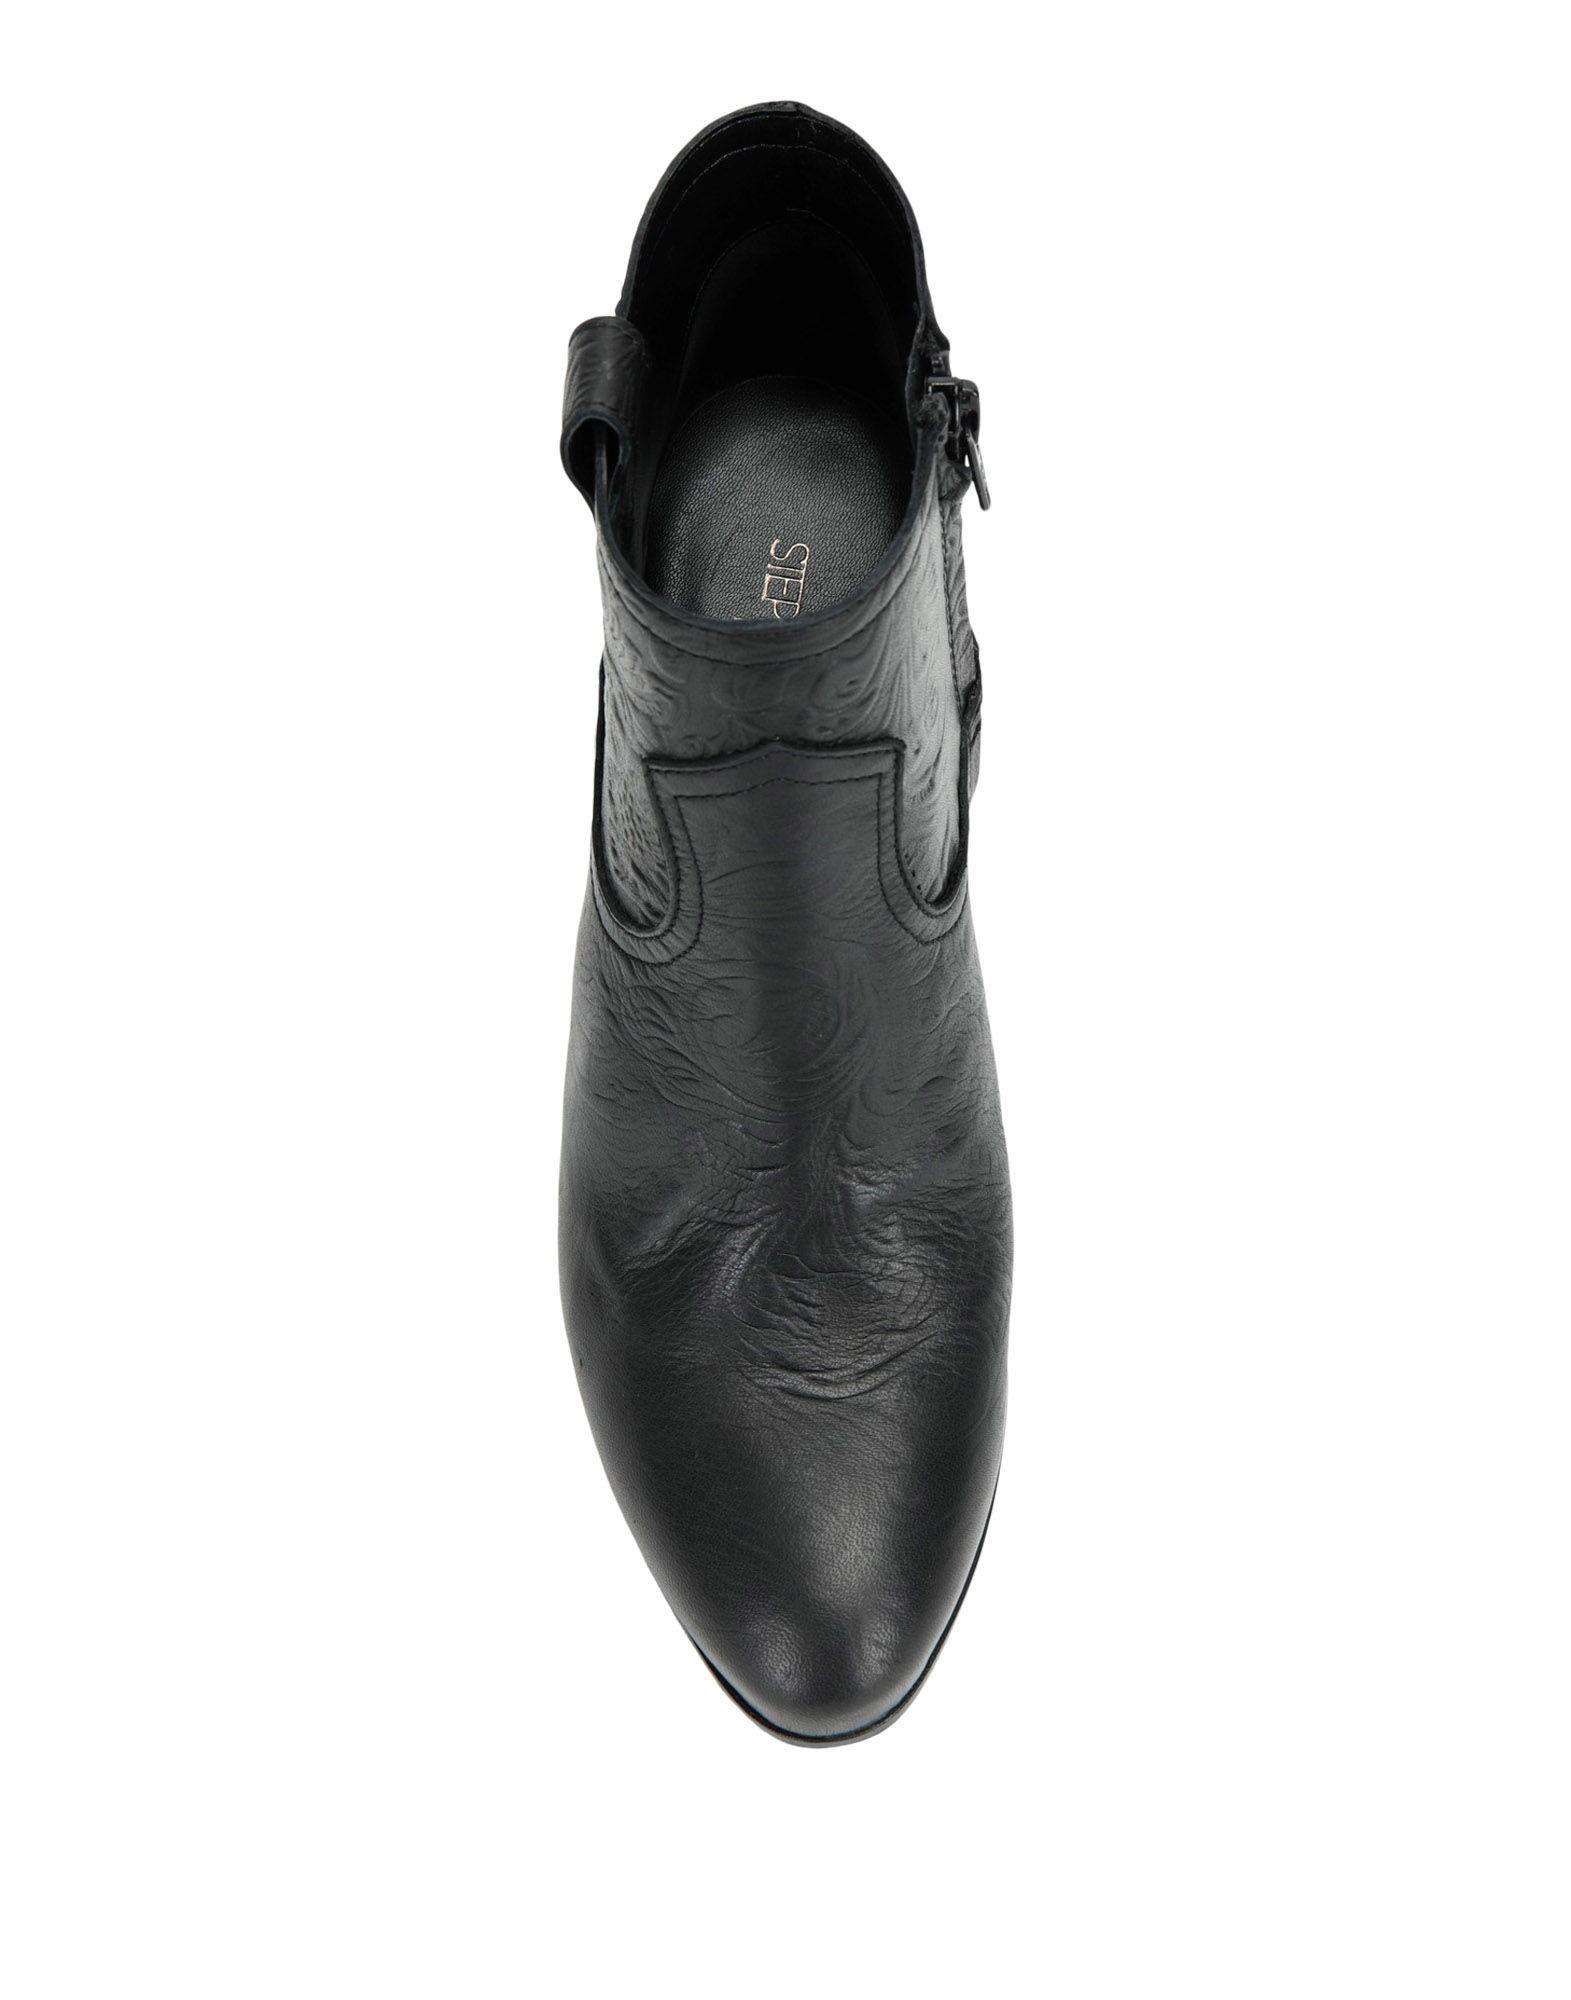 Stilvolle billige Schuhe Damen Stephen Good  London Stiefelette Damen Schuhe  11532928AA 1df0d4